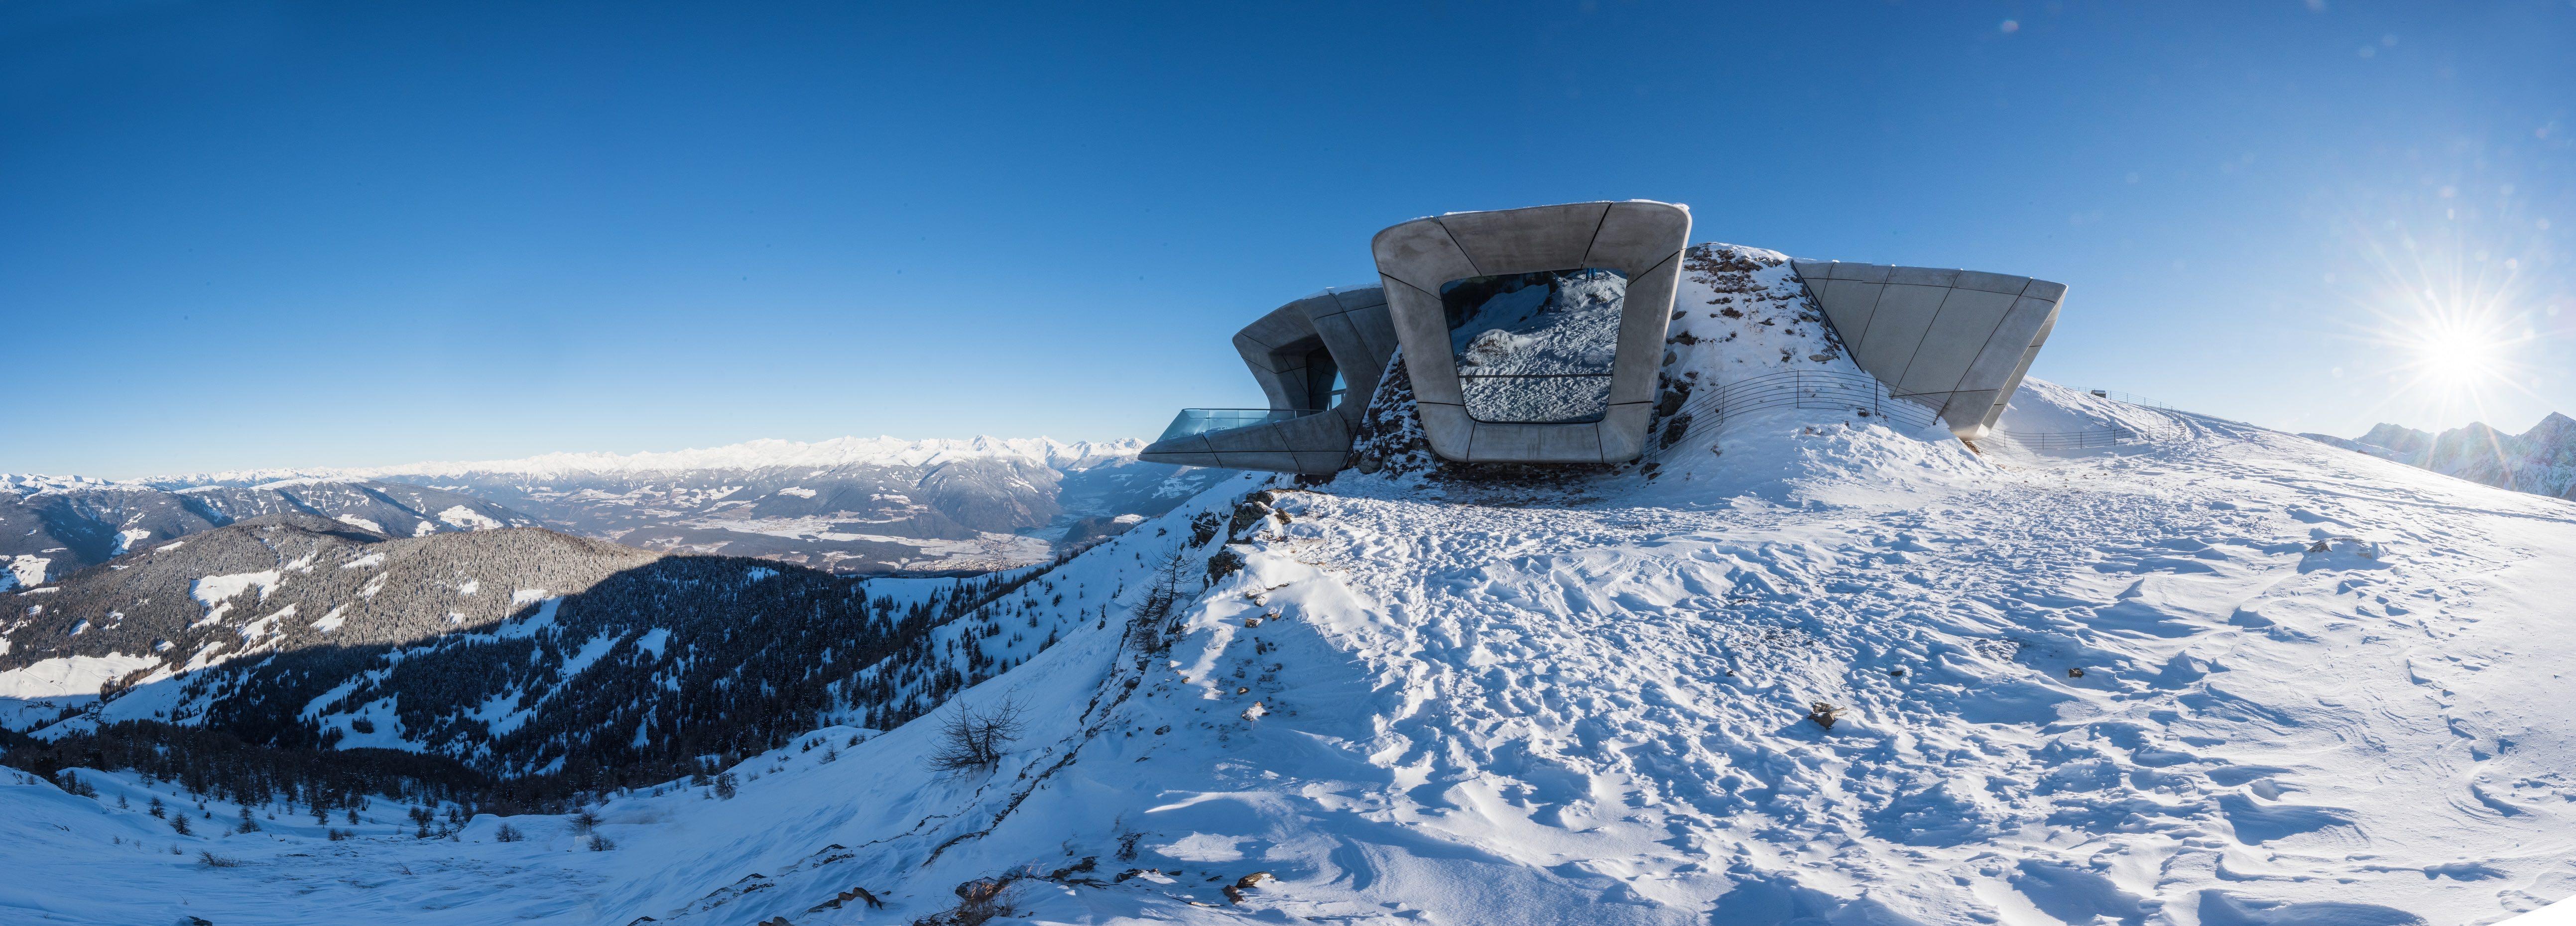 Zaha Hadid Messner Mountain Museum (Museo della montagna Messner), Plan de Corones 2015 Foto Harald Wisthaler, courtesy Zaha Hadid Architects